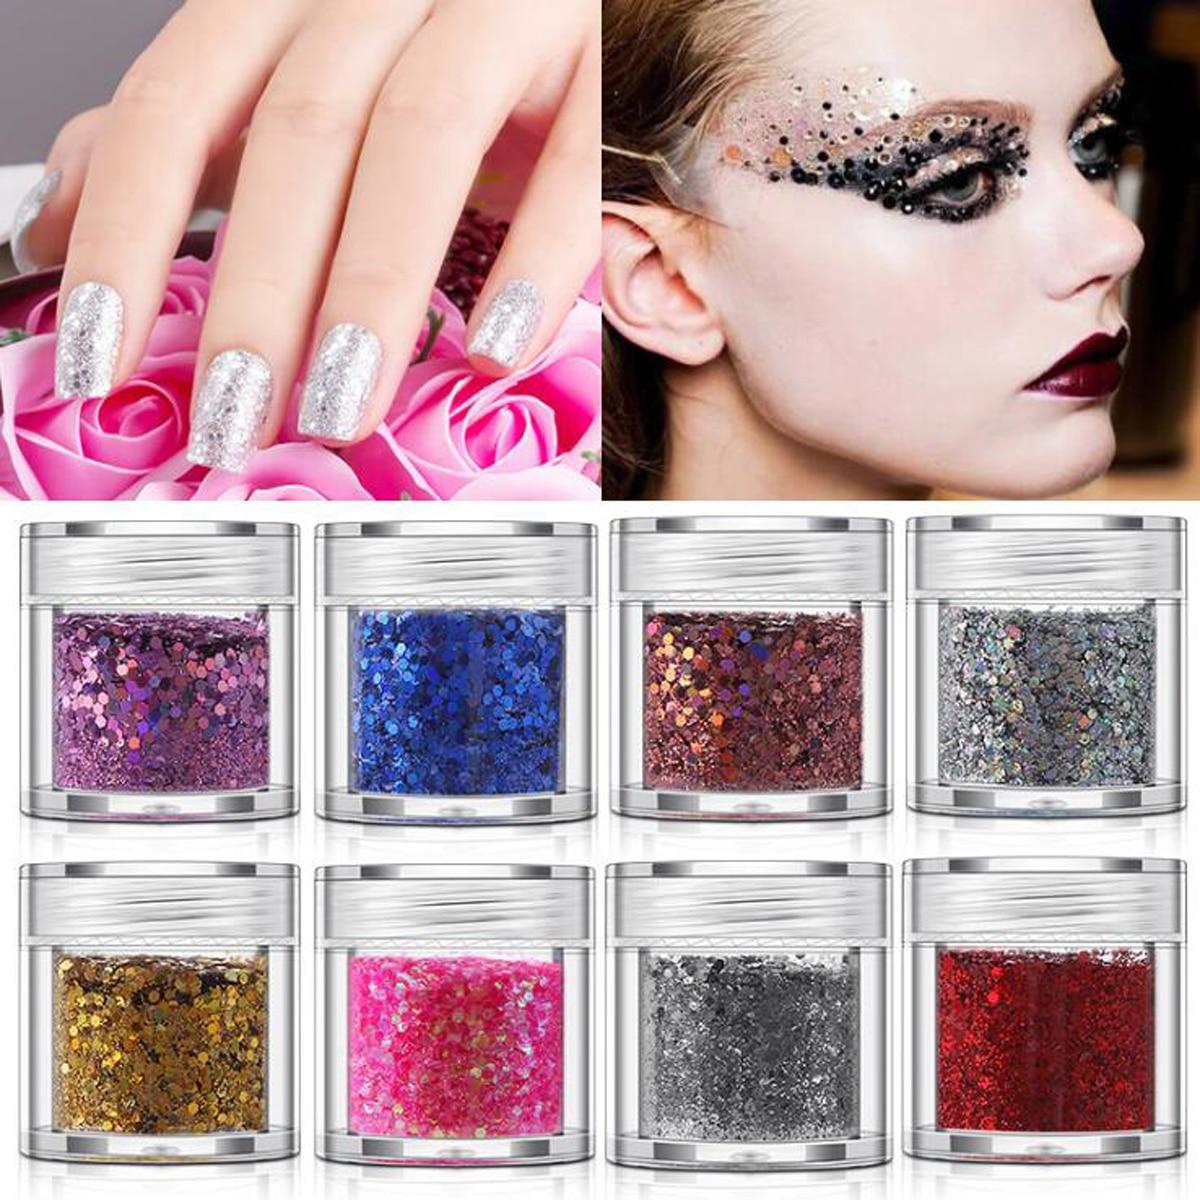 1box Ultrathin Sequins Nail Glitter Flakes Irregular Polygon DIY Sparkly Paillette Nail Art Eye Lip Makeup Decoration